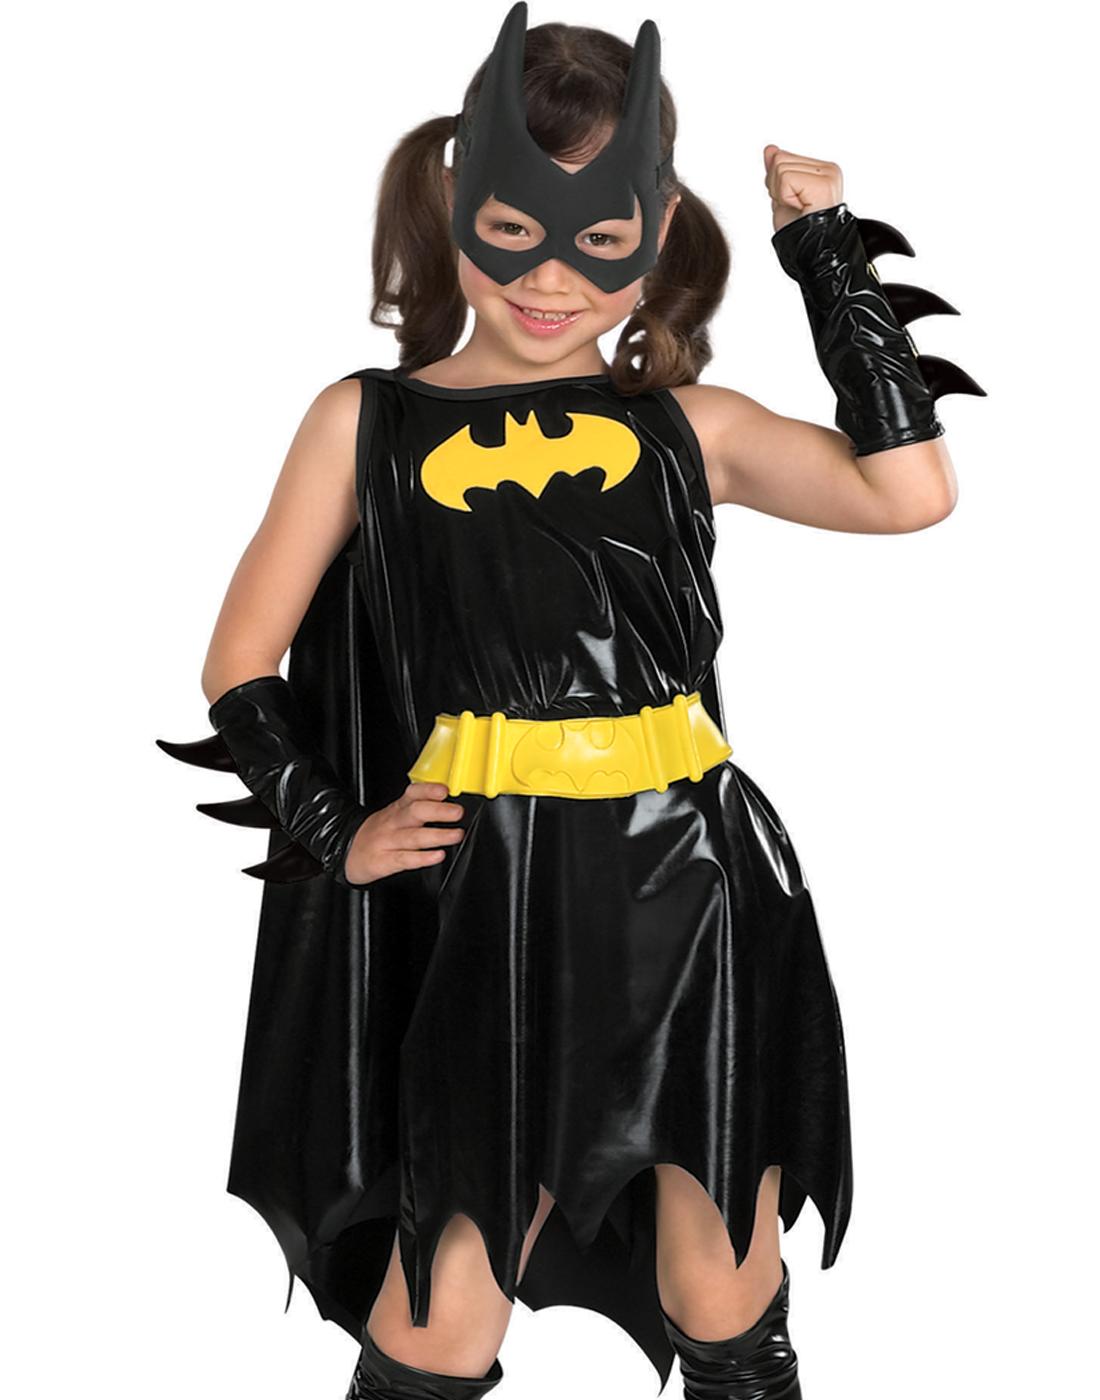 Rubie's Costume Co Batgirl Batman Girls The Dark Knight Rises Halloween Fancy Child's Costume S-L at Sears.com